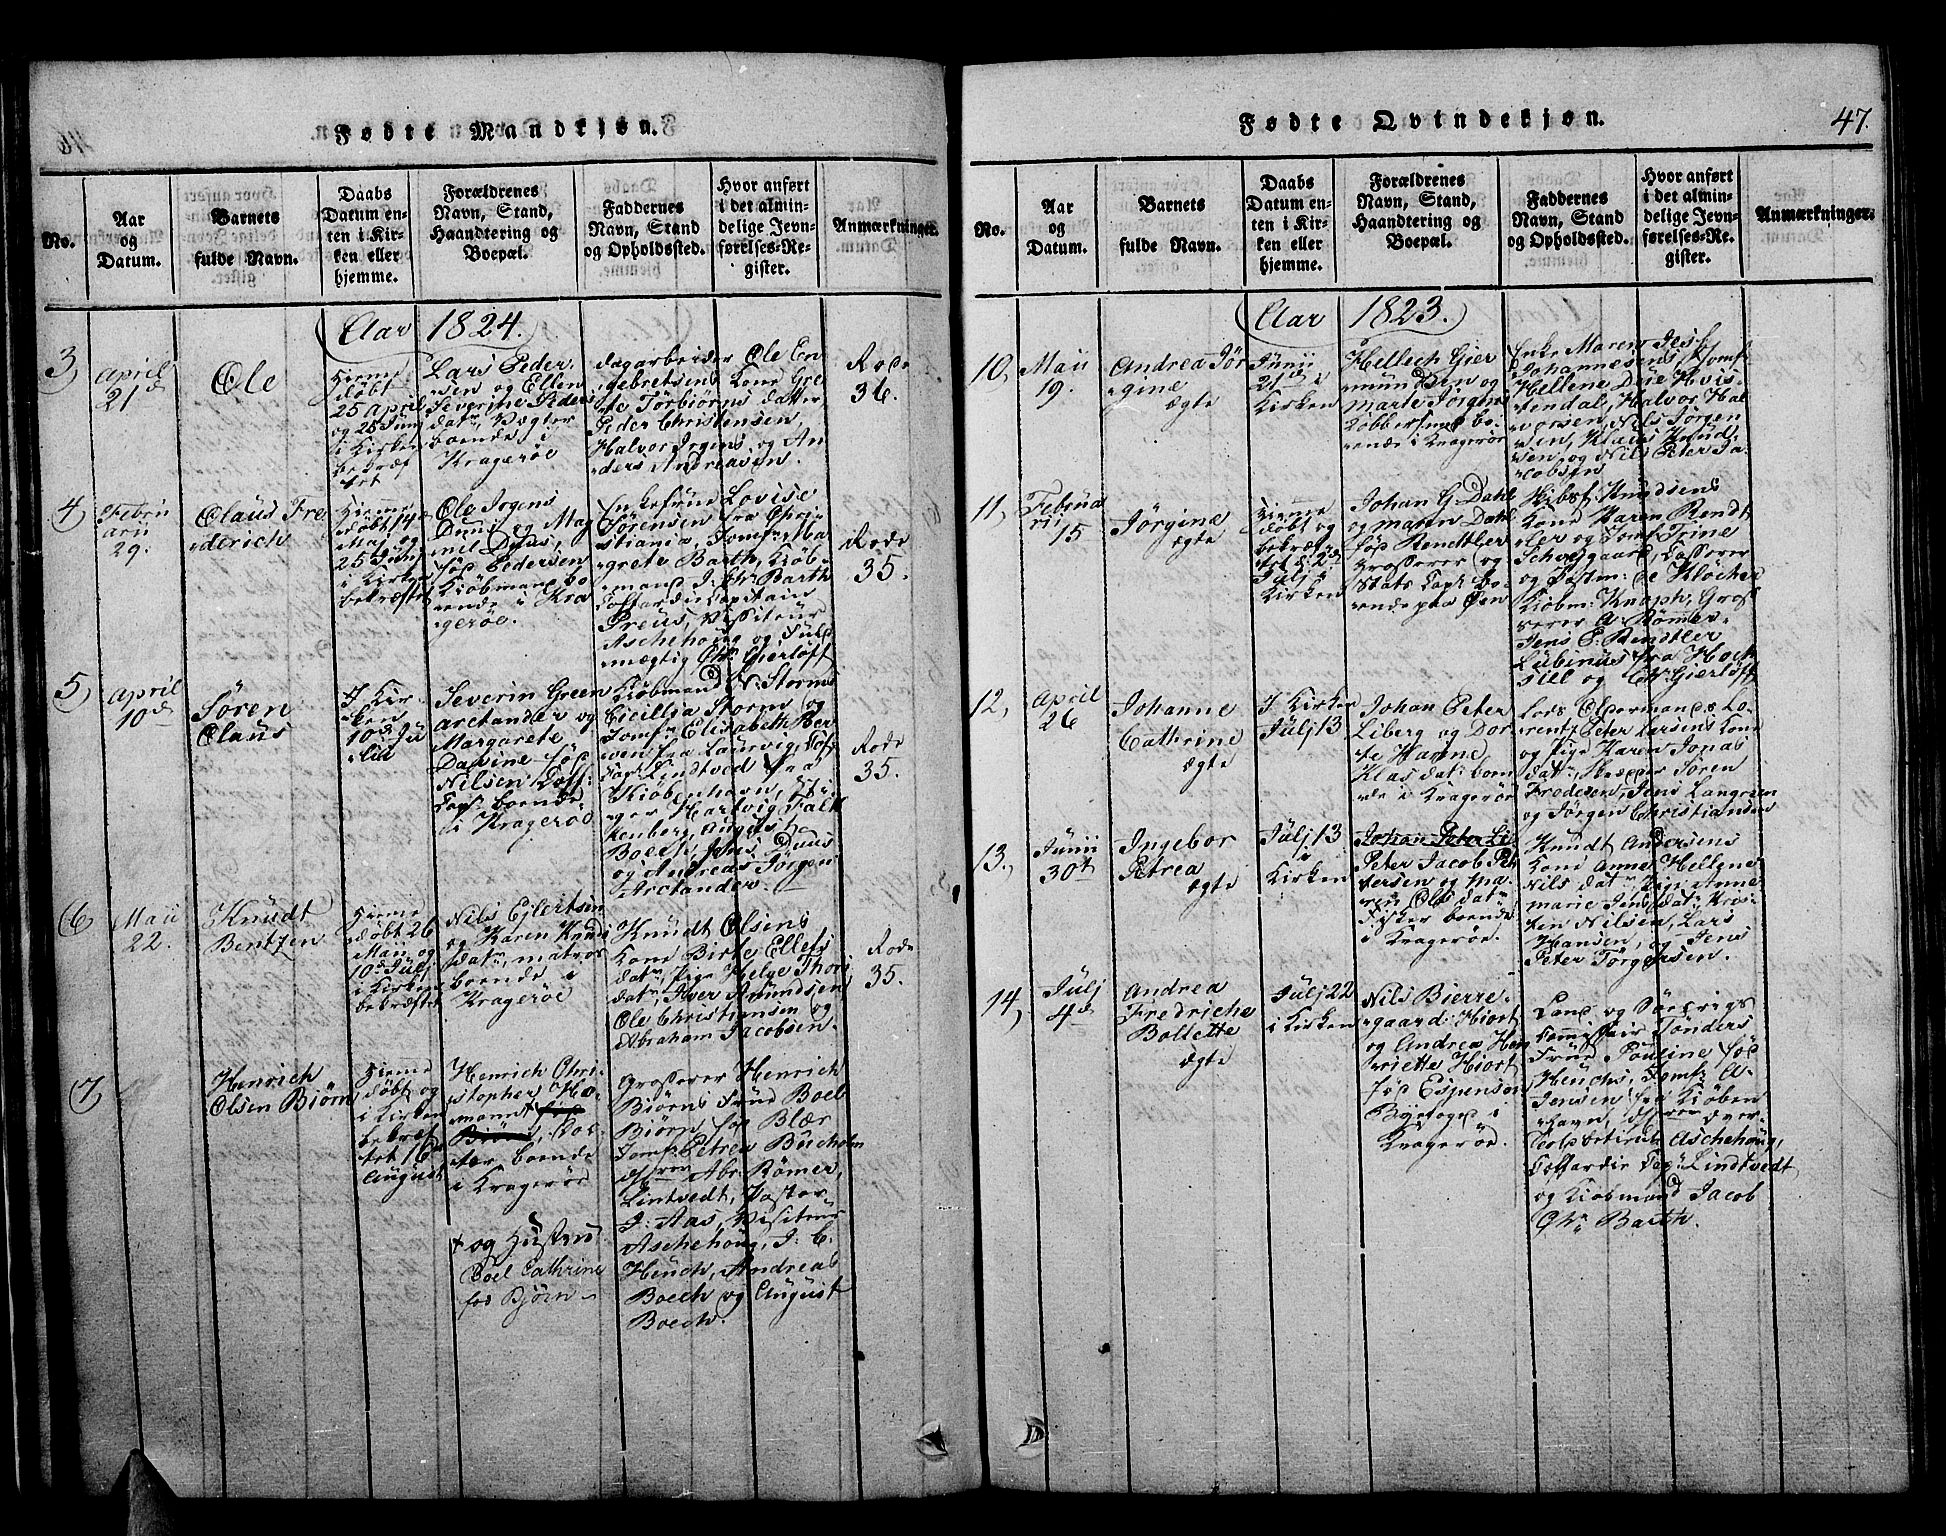 SAKO, Kragerø kirkebøker, F/Fa/L0004: Ministerialbok nr. 4, 1814-1831, s. 47